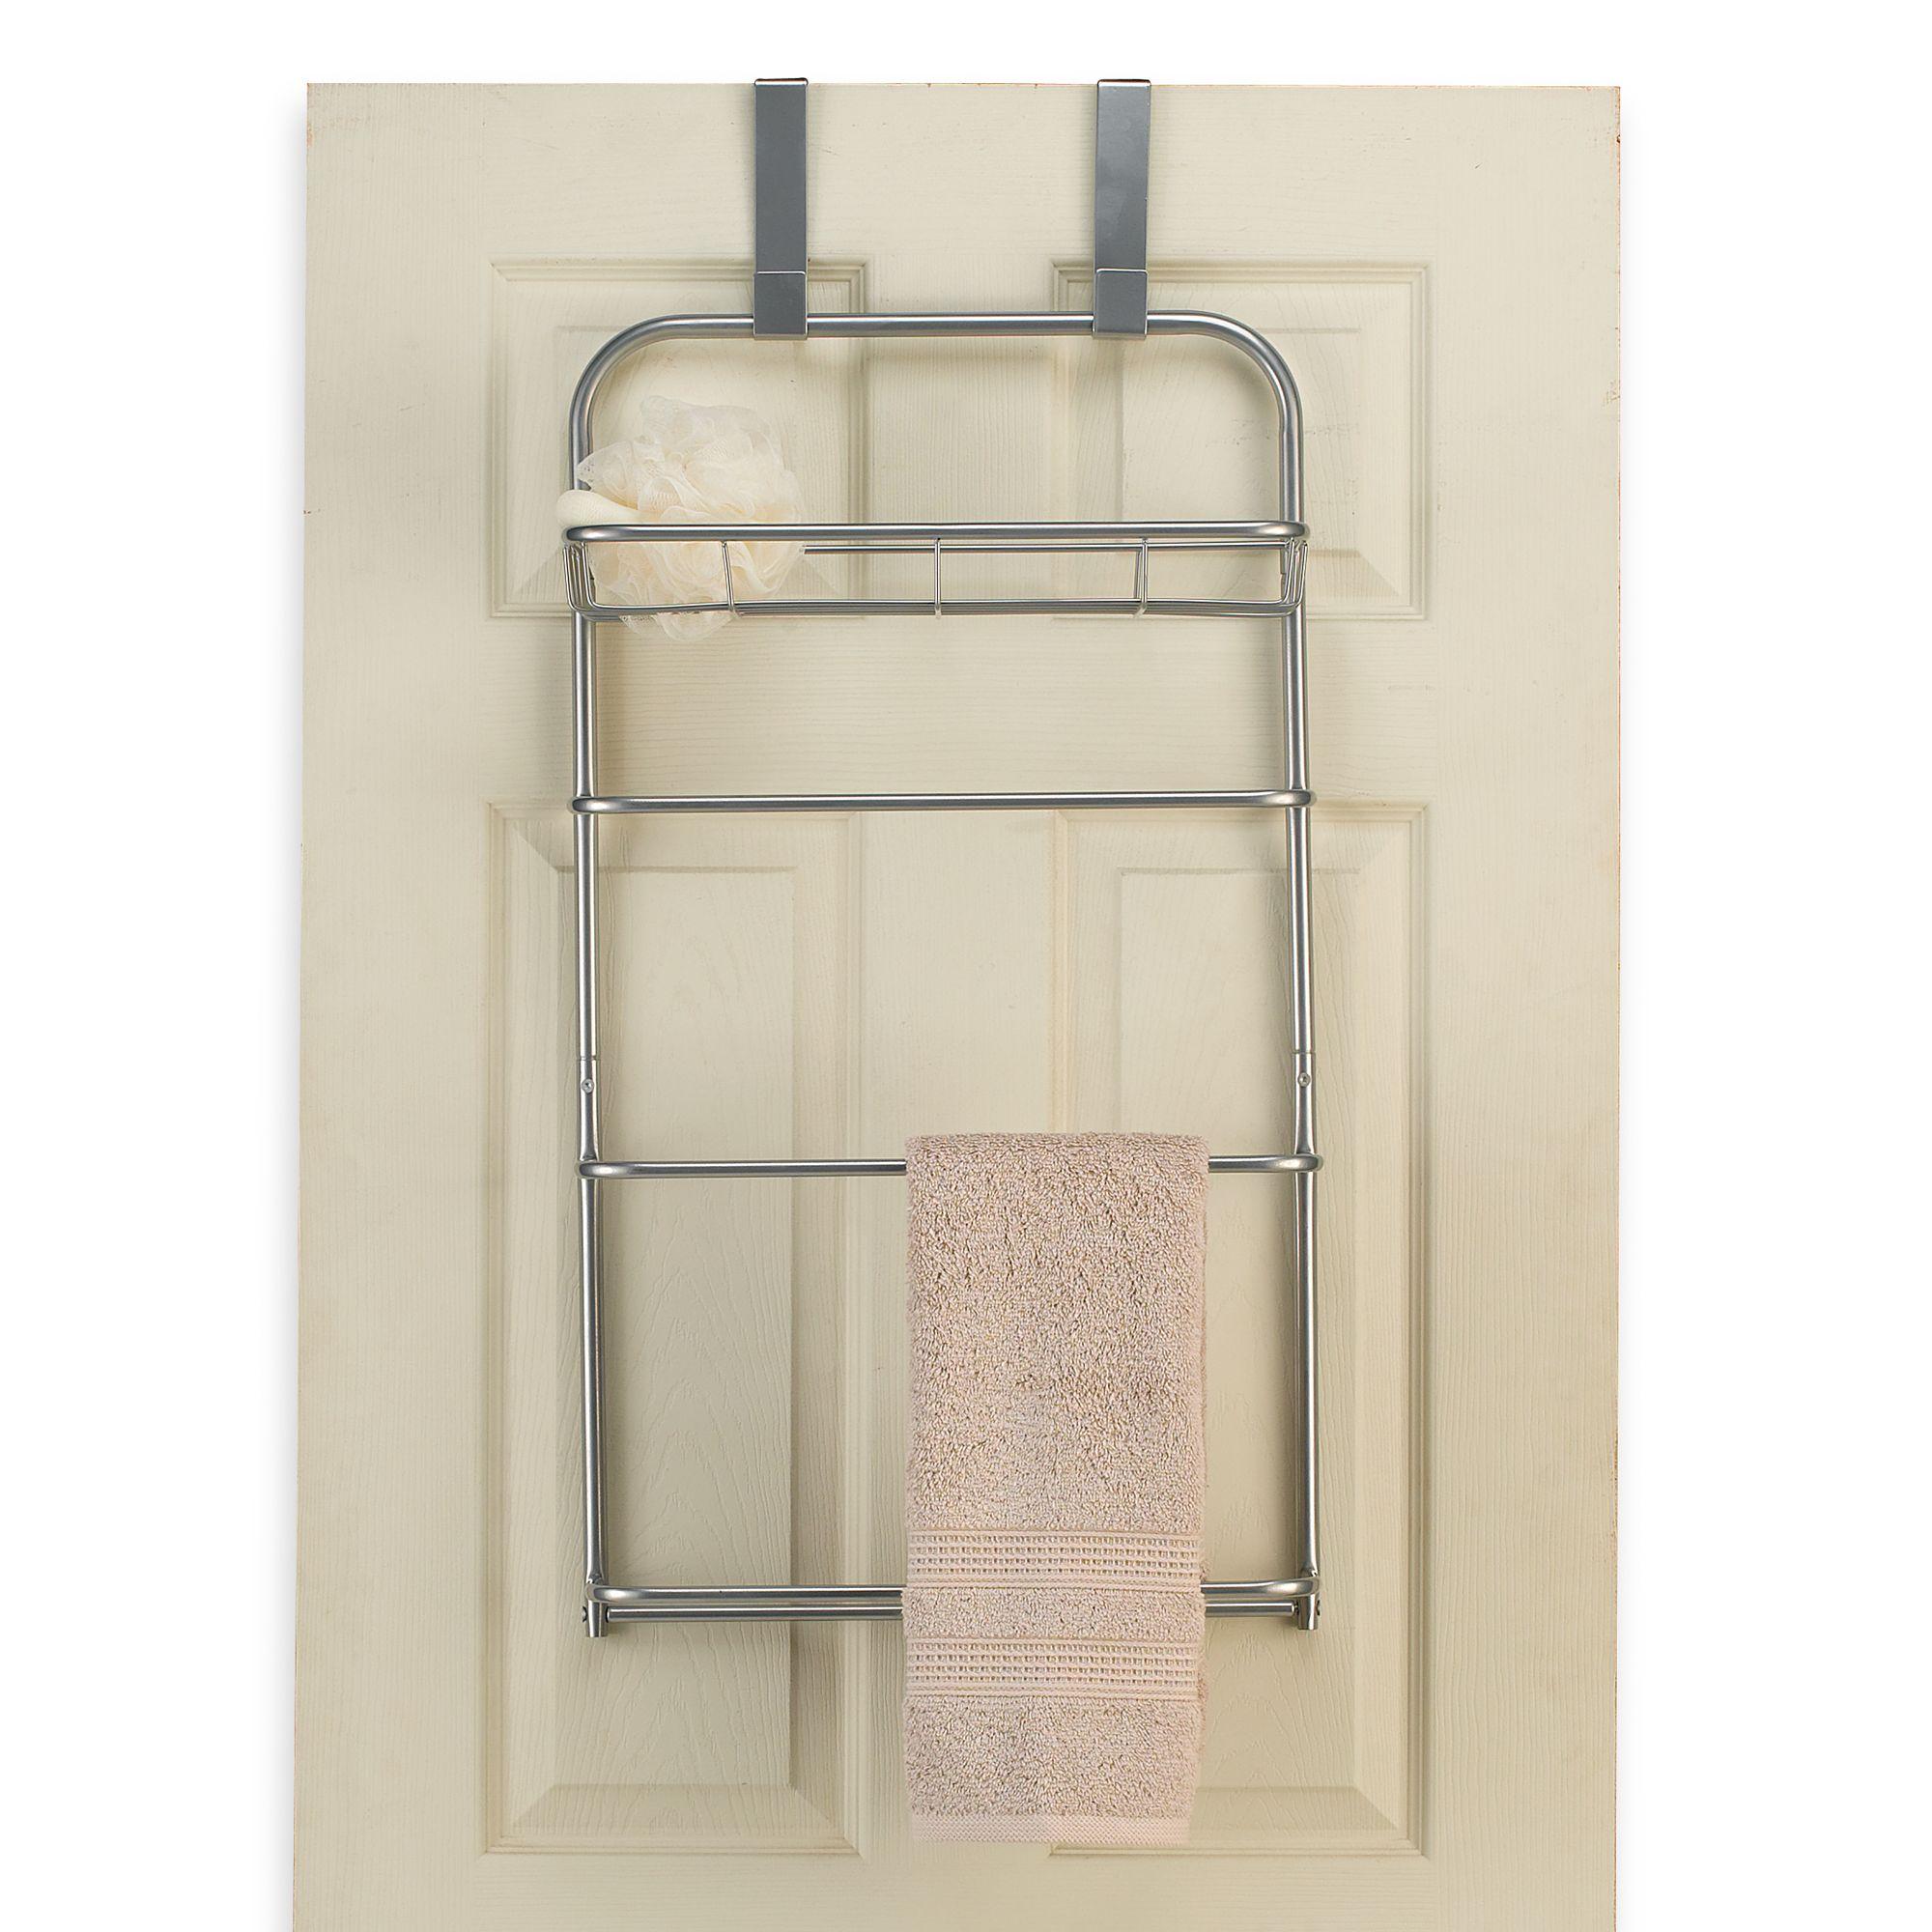 bath towel racks stands holders warmers bed bath beyond image of lina over the door towel bars